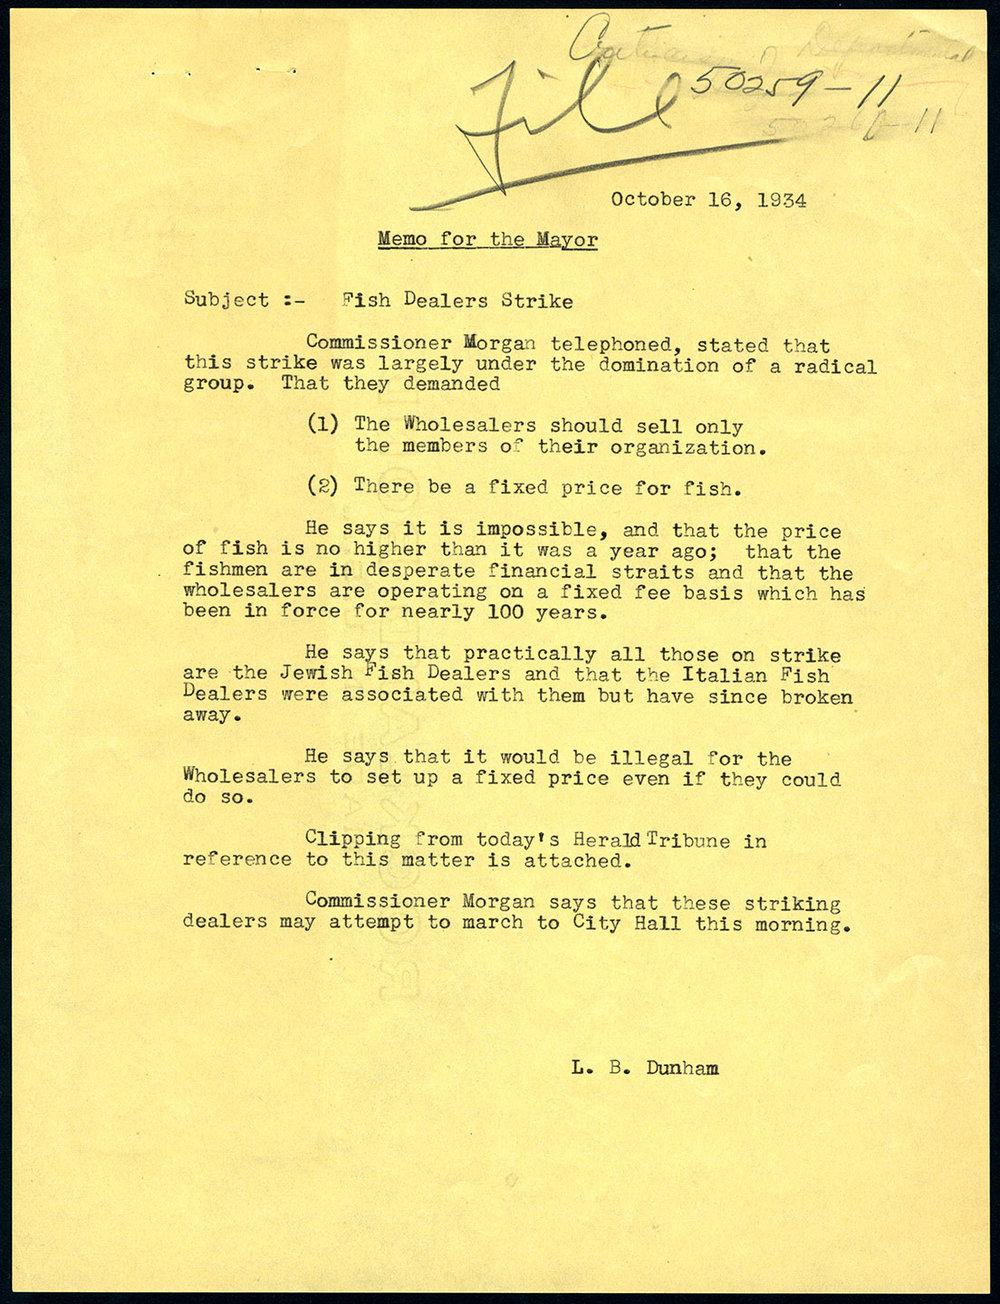 Memo to Mayor LaGuardia from secretary L.B. Dunham, Oct. 16, 1934. Mayor LaGuardia Collection, NYC Municipal Archives.